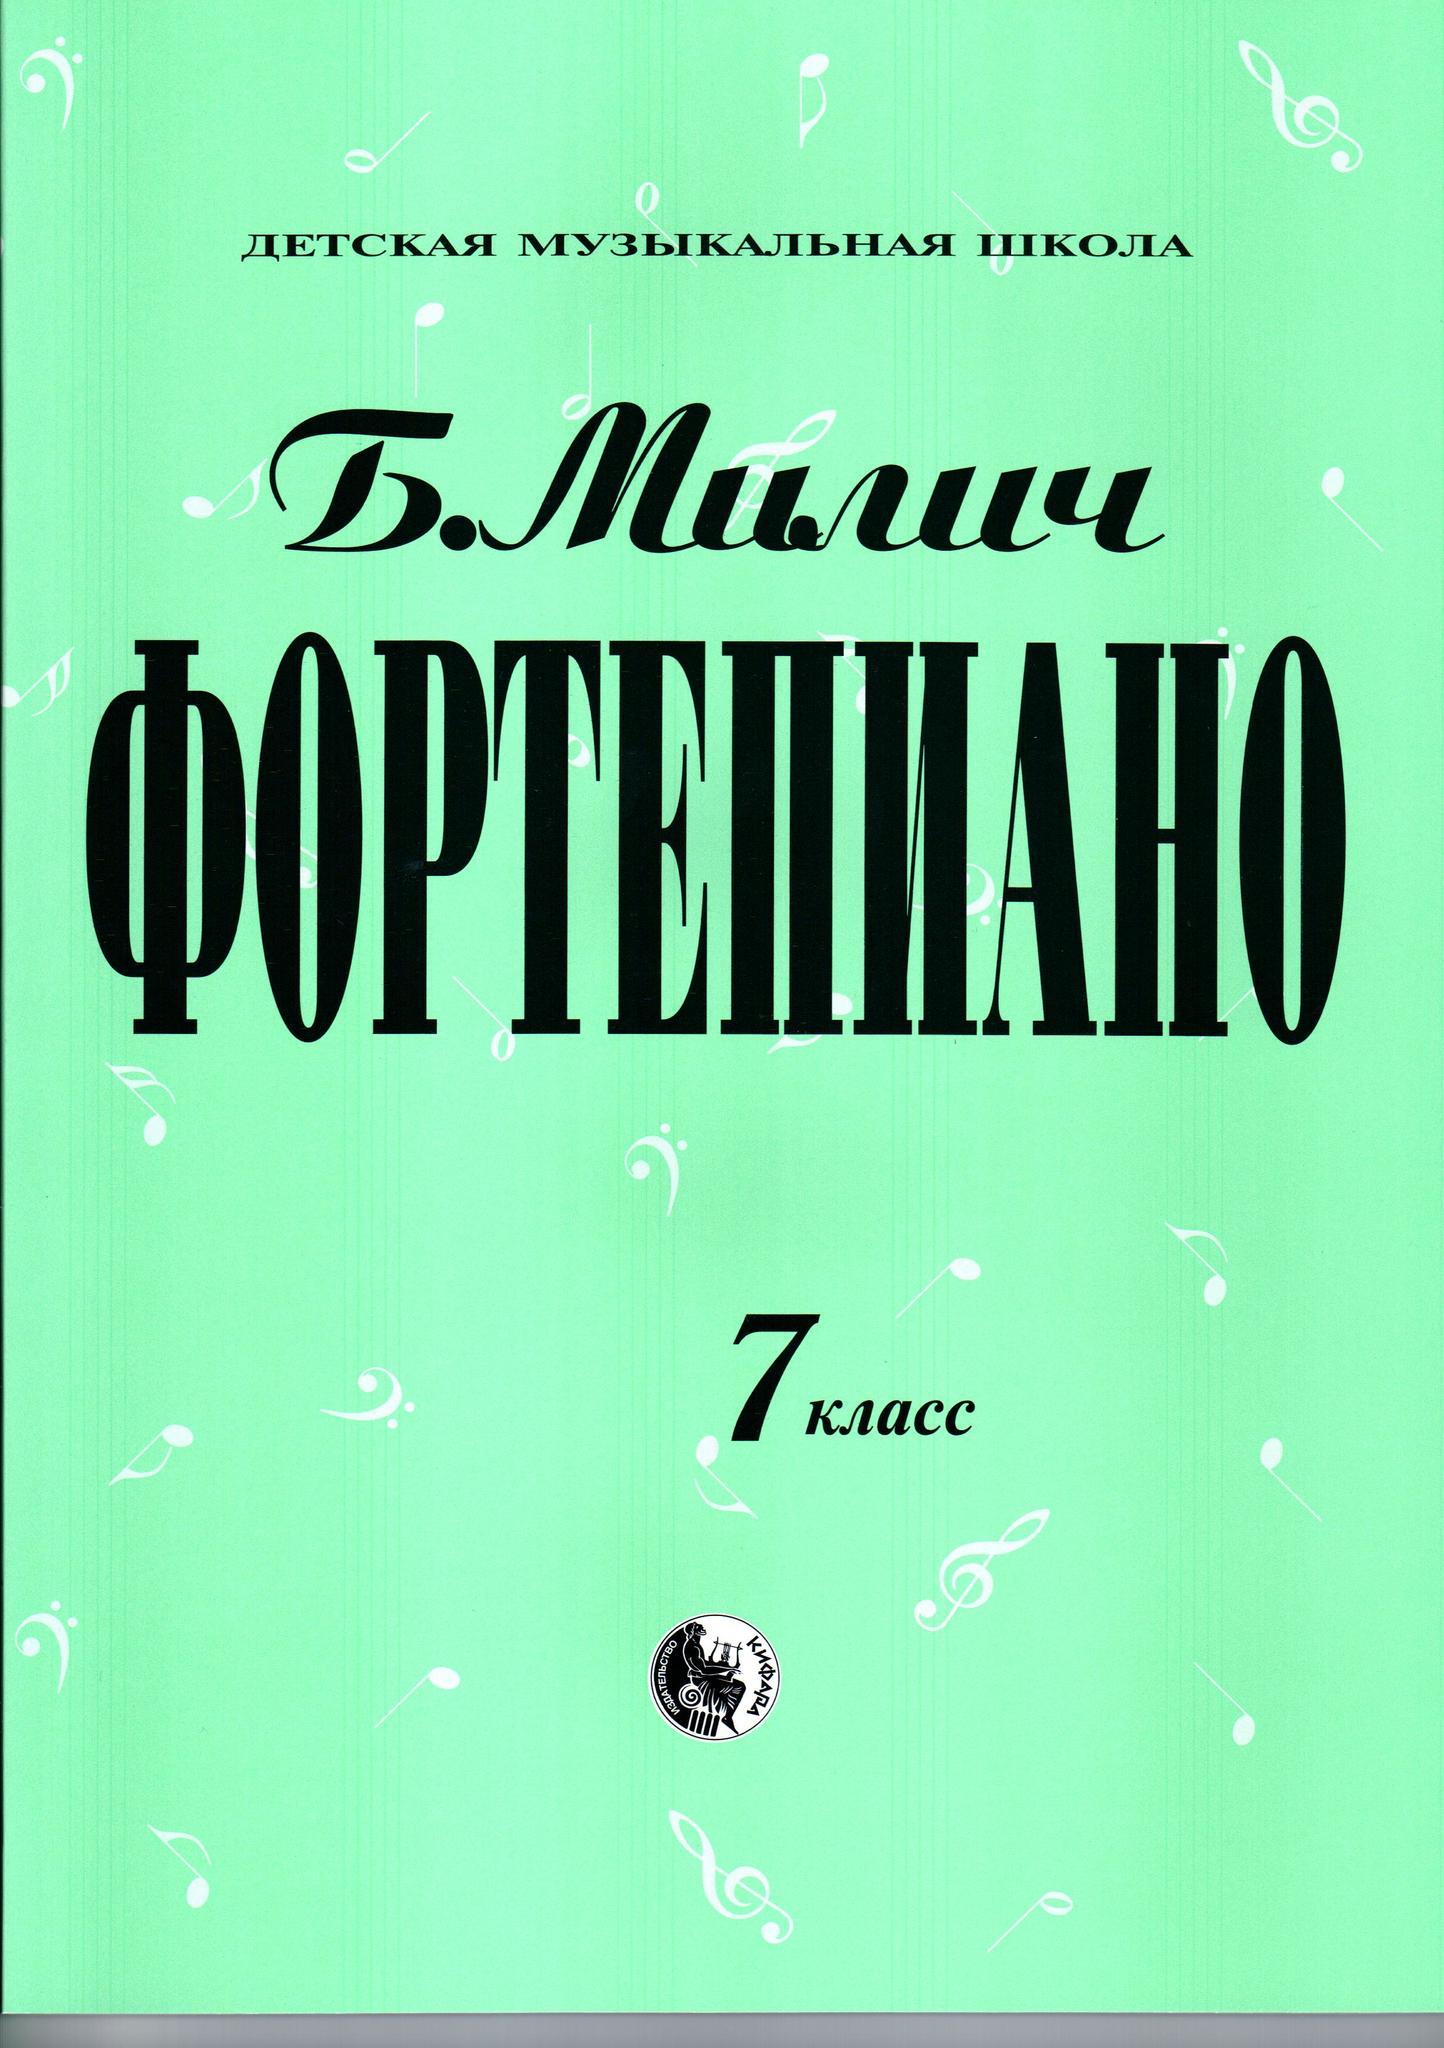 Милич Б. Фортепиано. 7 класс ДМШ